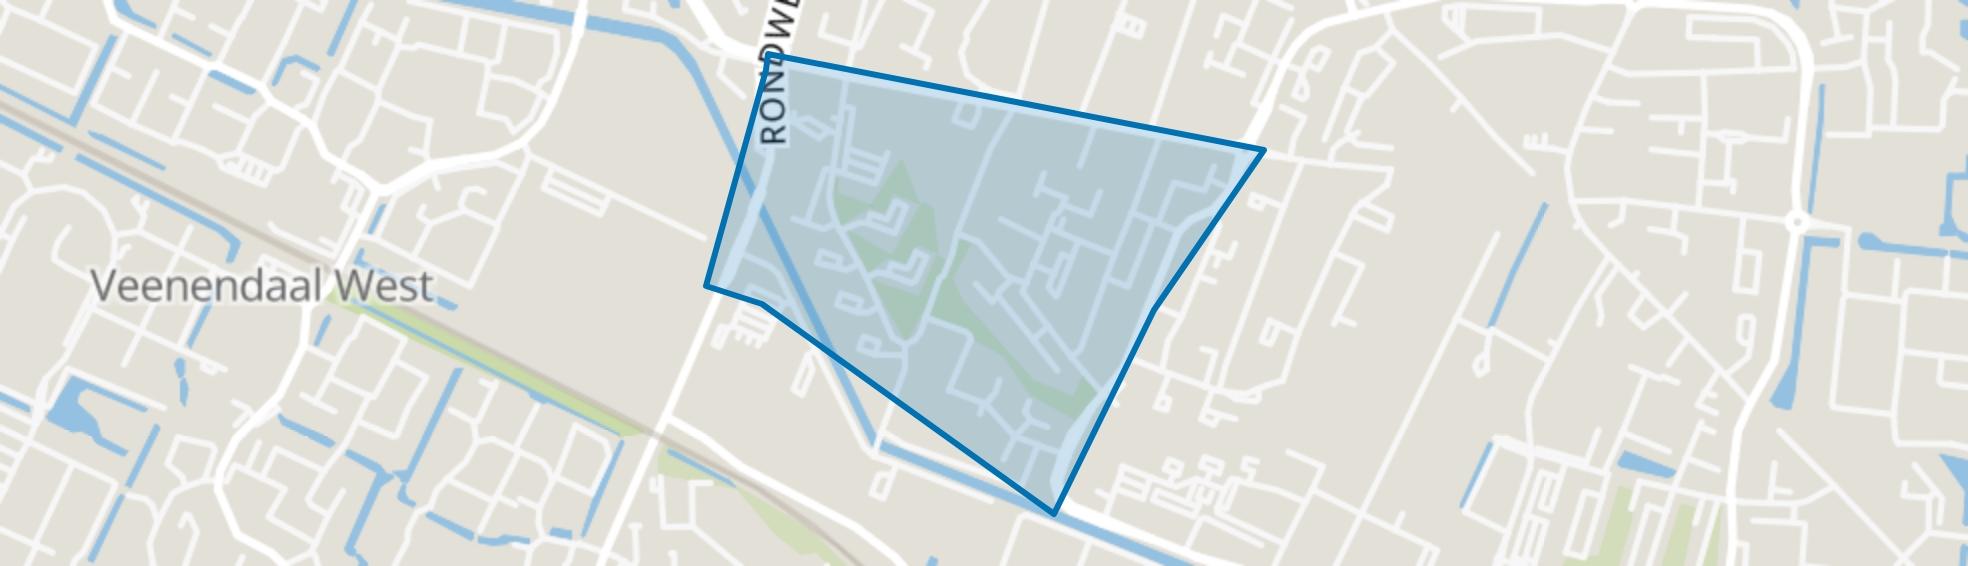 Molenbrug, Veenendaal map